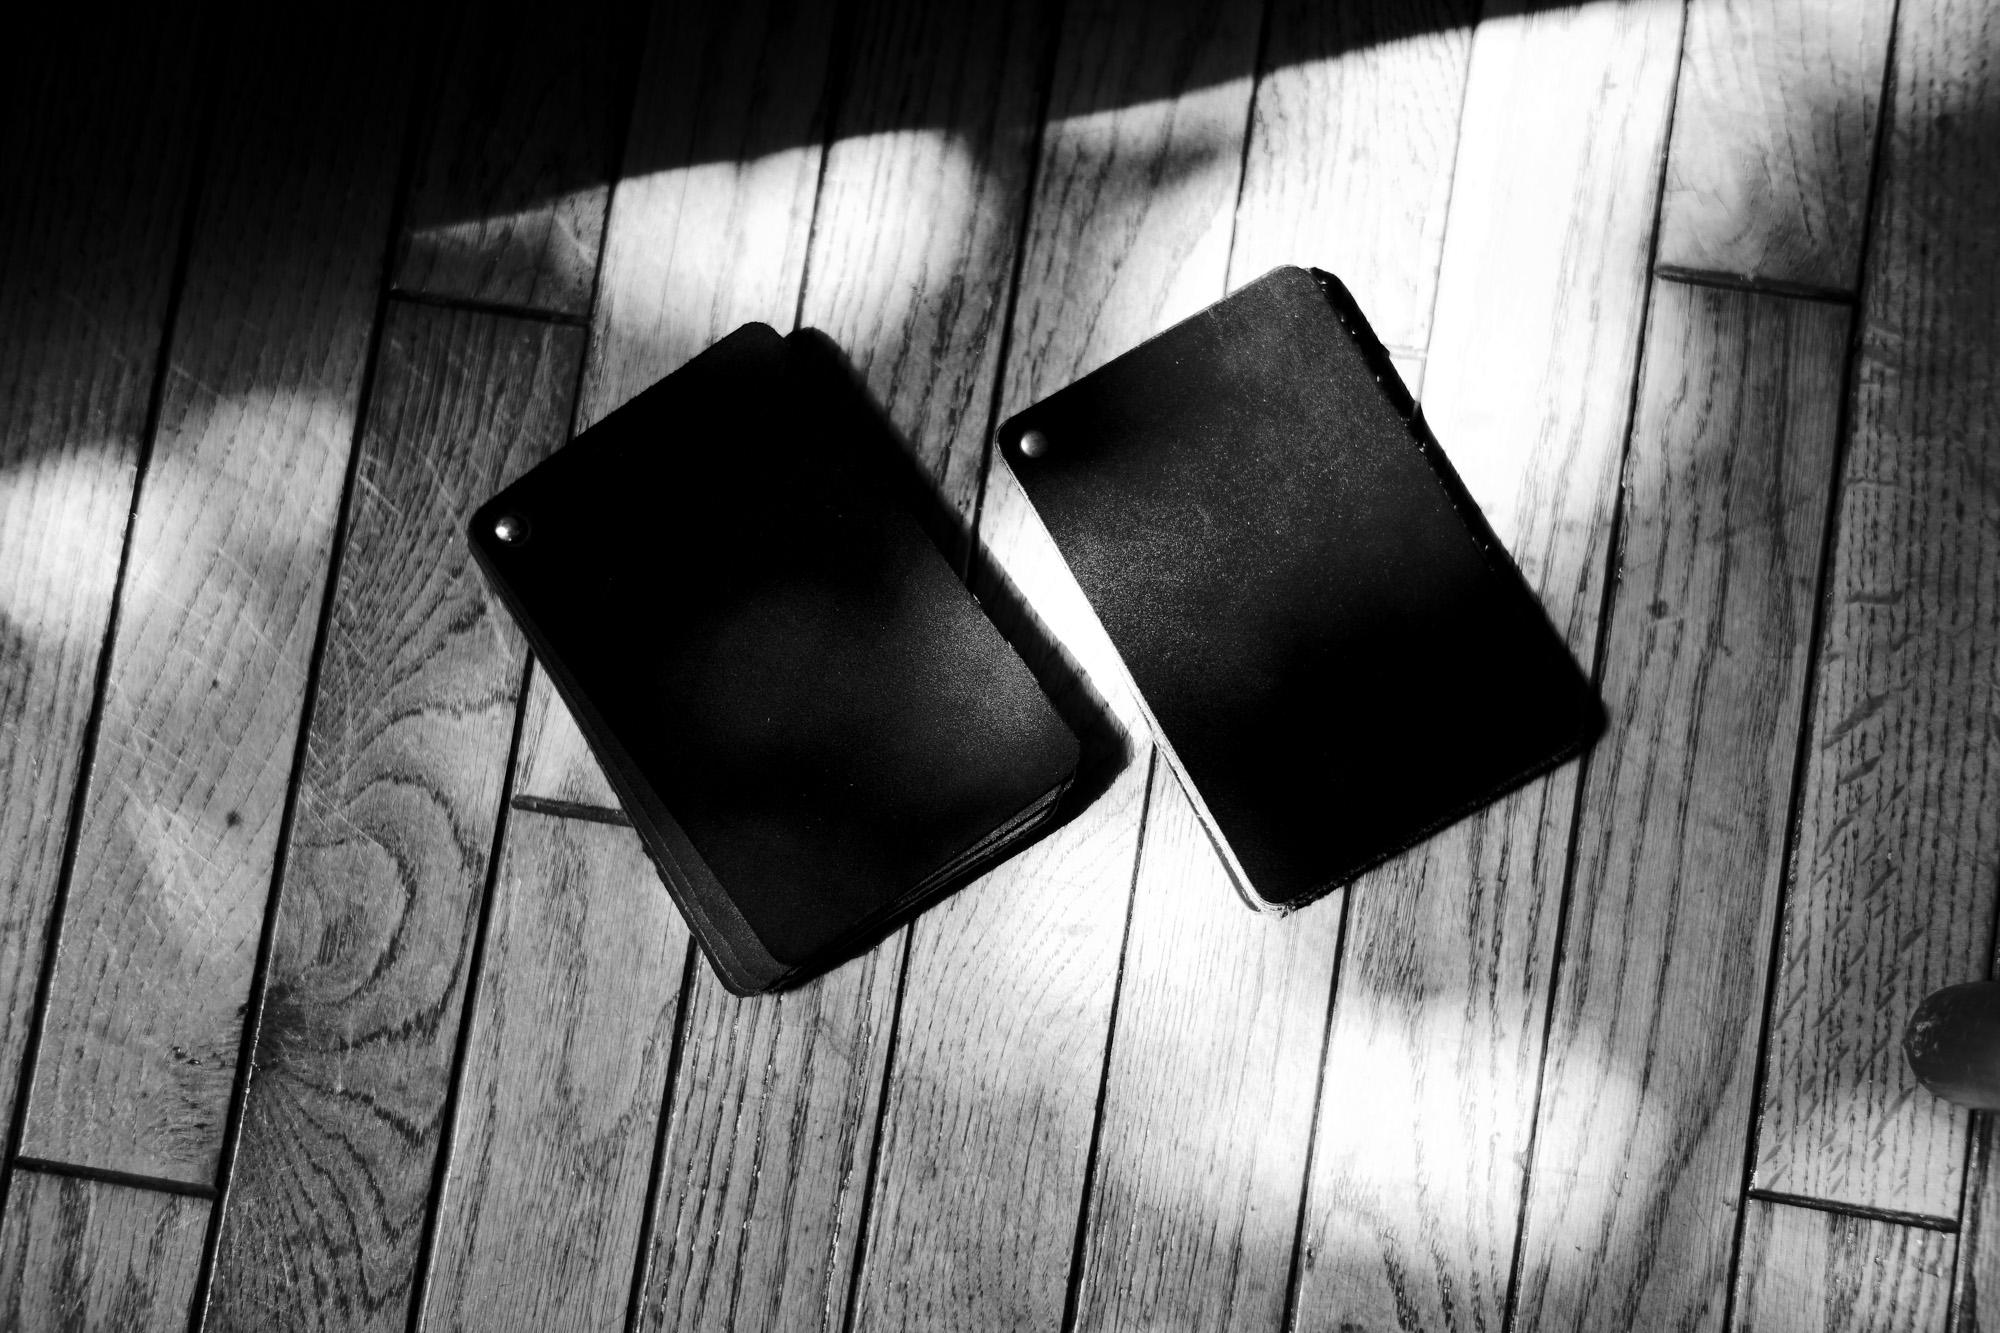 "Yohei Fukuda // ""3 Eyelet Chukka Boots"" Black Suede Leather BLACK 【Alto e Diritto 別注】【Special Model】ヨウヘイフクダ 福田洋平 3アイレット チャッカブーツ ブラックスエードレザー ブラック アルトエデリット別注 スペシャルモデル シューツリー込み UK4.5E~UK9.5E 愛知 名古屋 Alto e Diritto altoediritto アルトエデリット ビスポーク MTO 受注会 オーダー会"